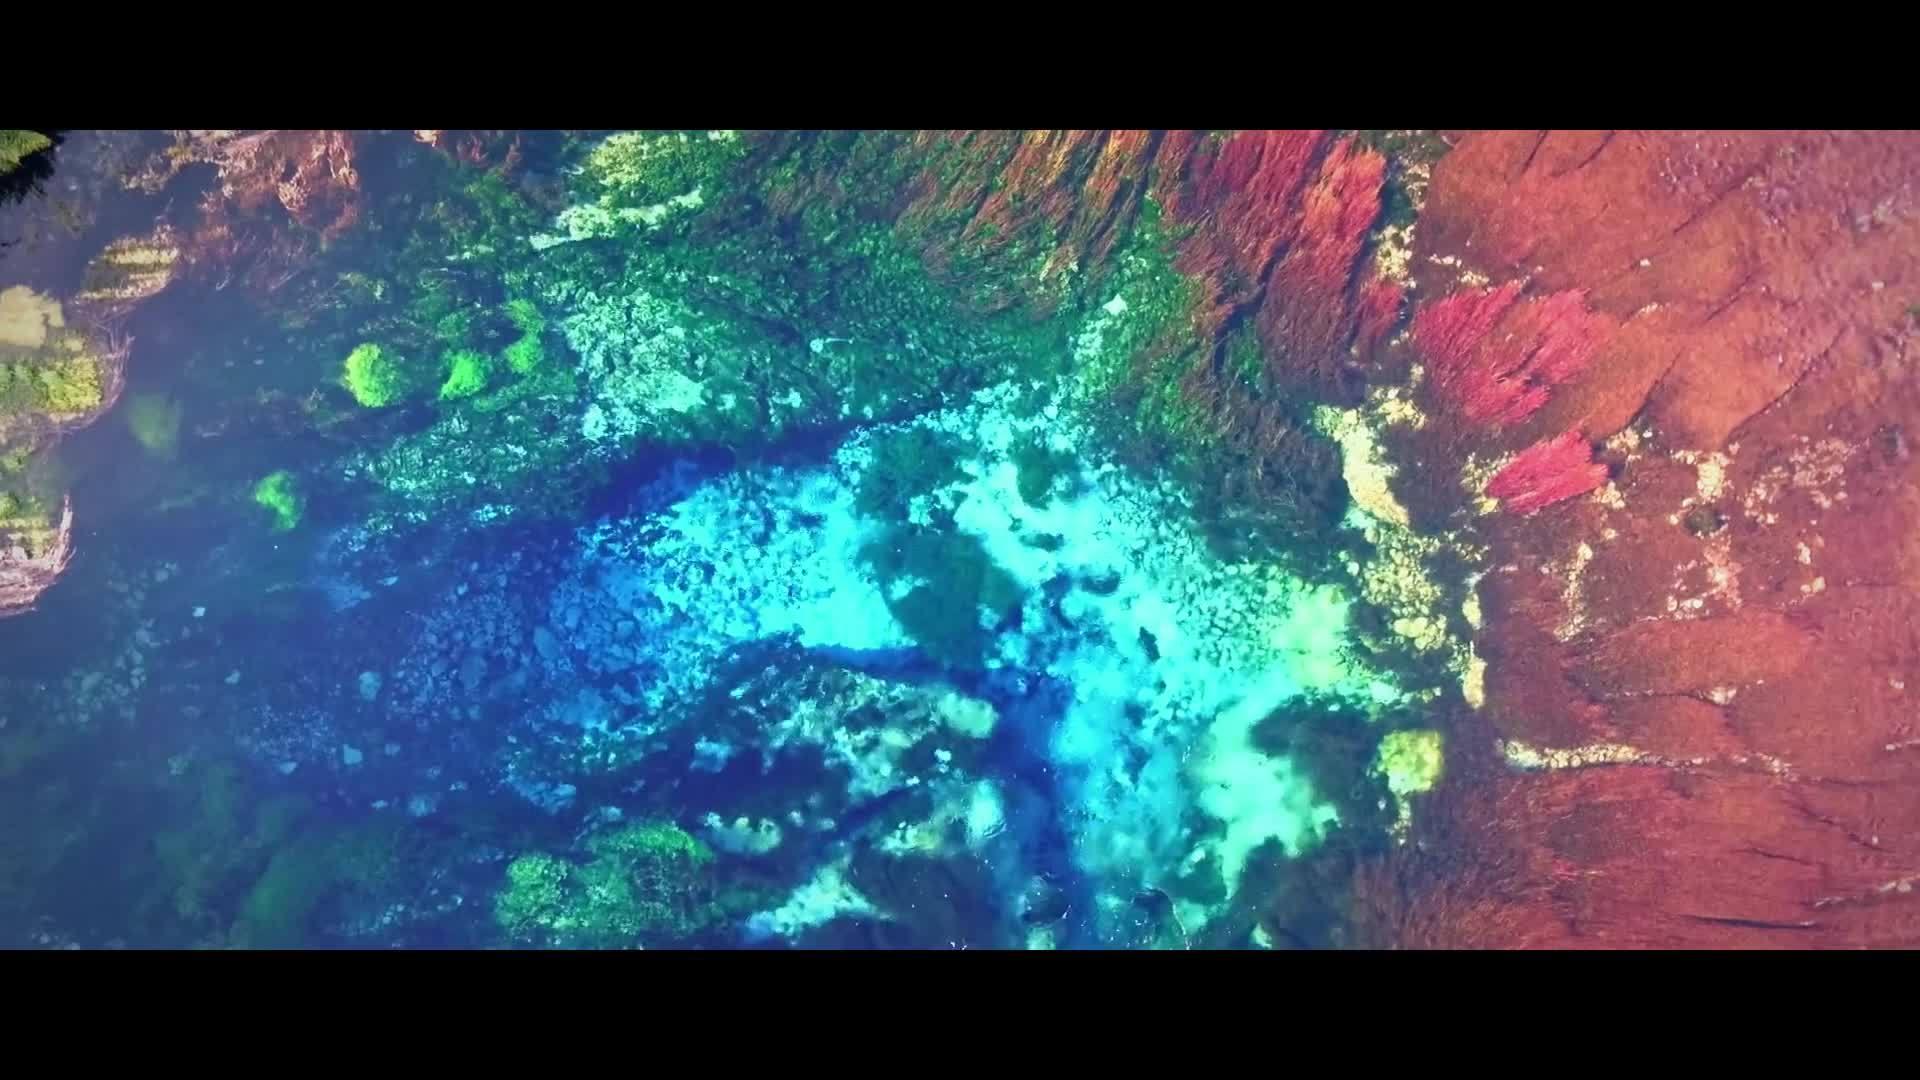 earthgifs, Aotearoa - New Zealand GIFs